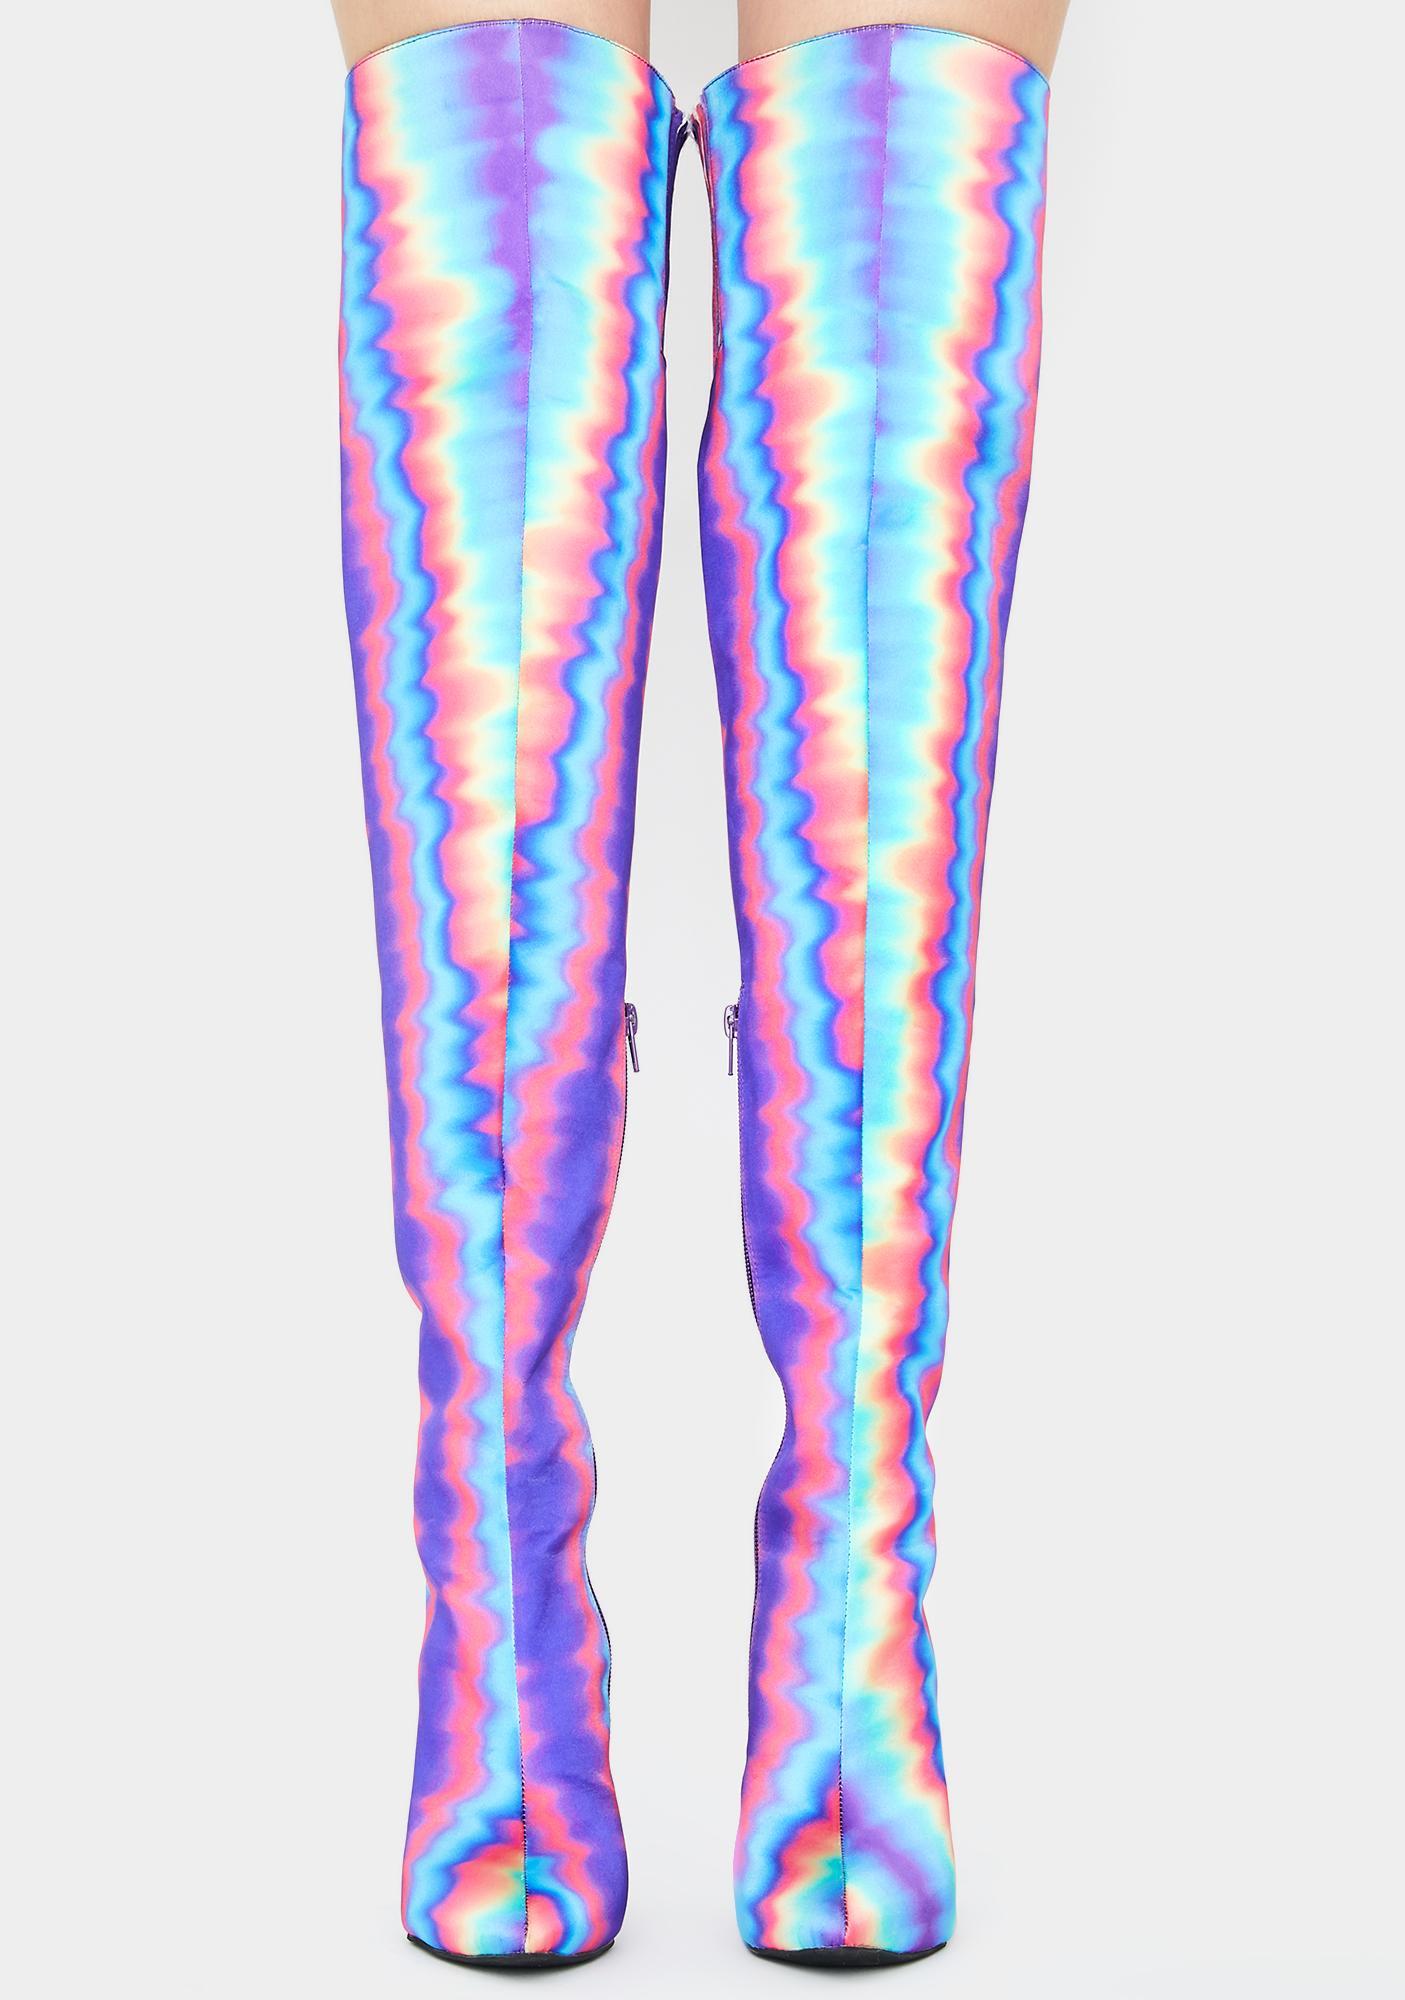 Club Exx Hypnotic Mist Thigh High Boots